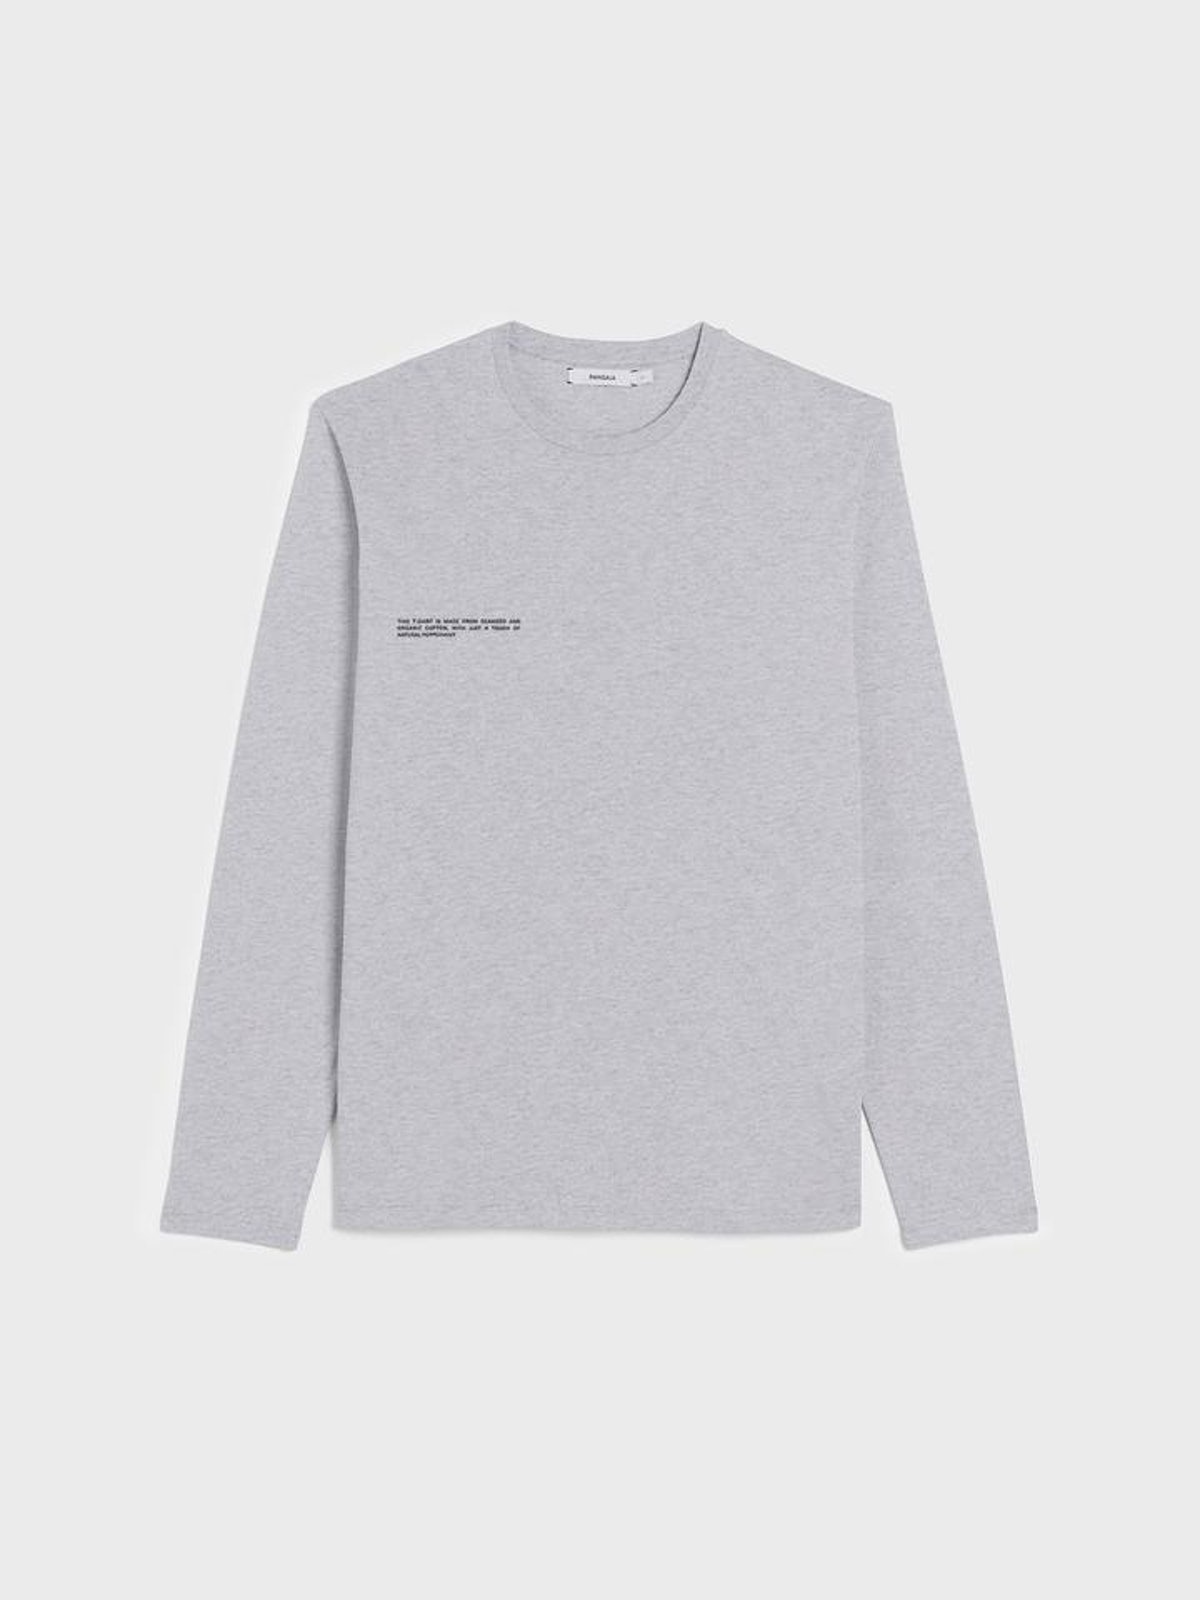 Organic cotton long sleeve t-shirt with C-FIBER